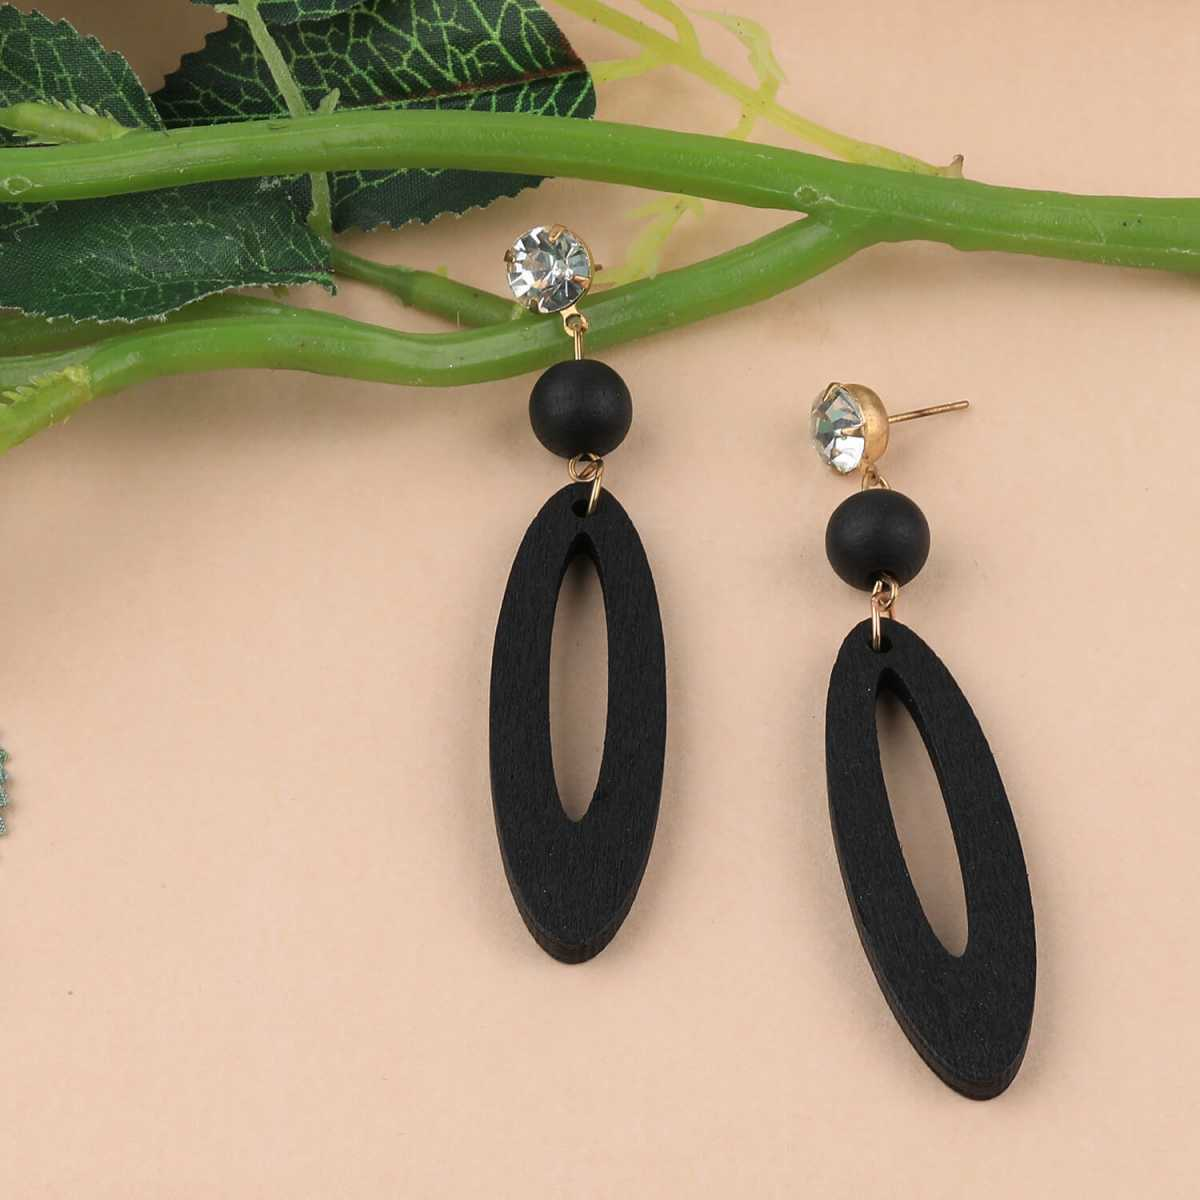 SILVER SHINE Exclusive Black Wooden Earrings Long Dangler Light Weight Earring for Girls and Women.